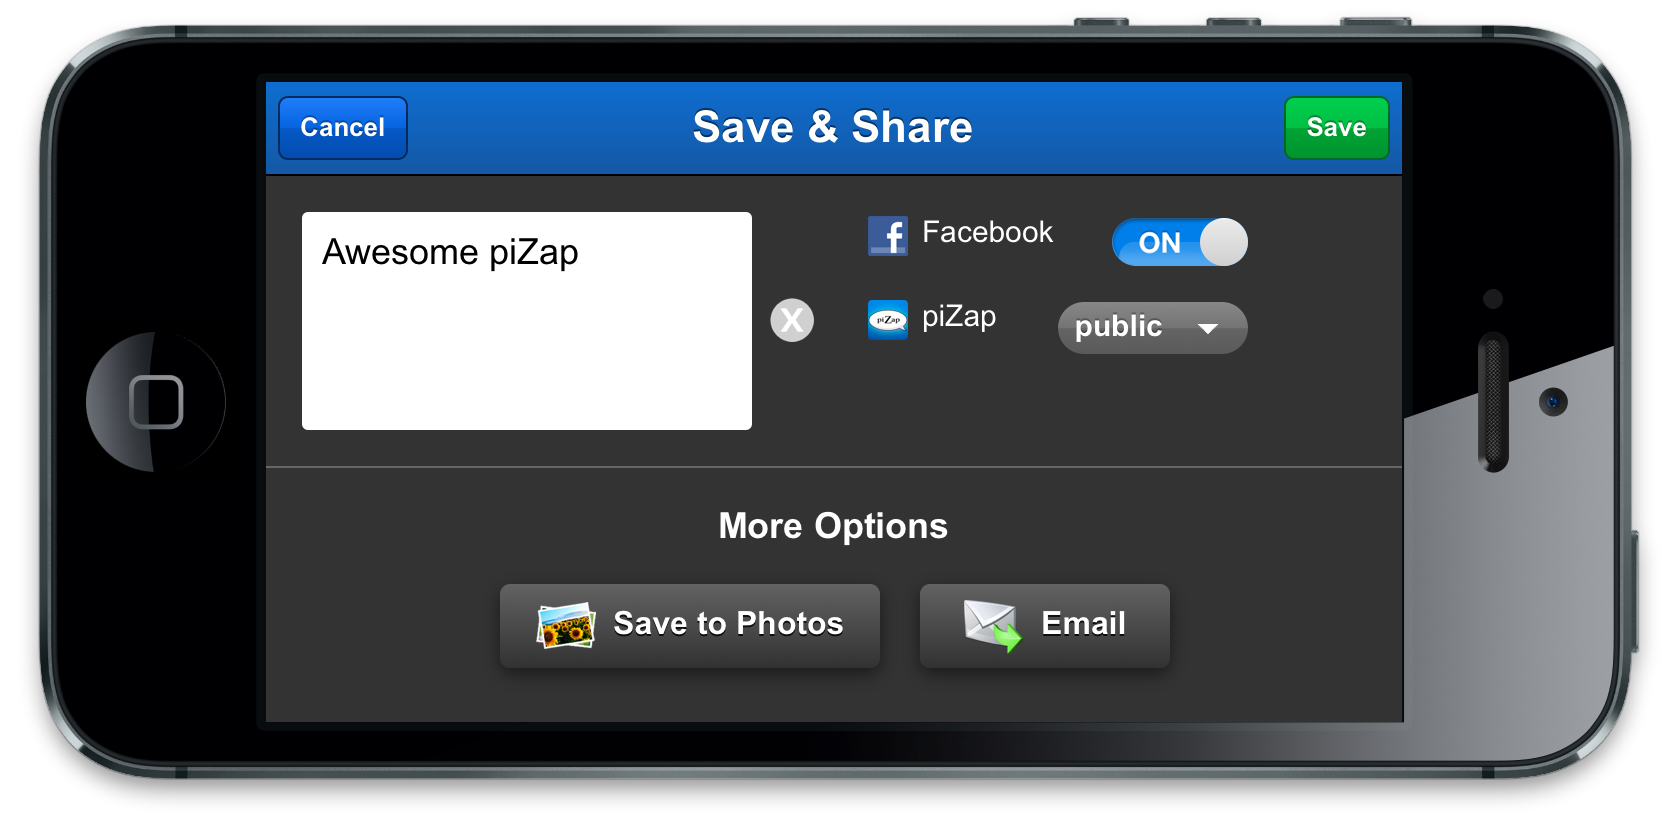 piZap save